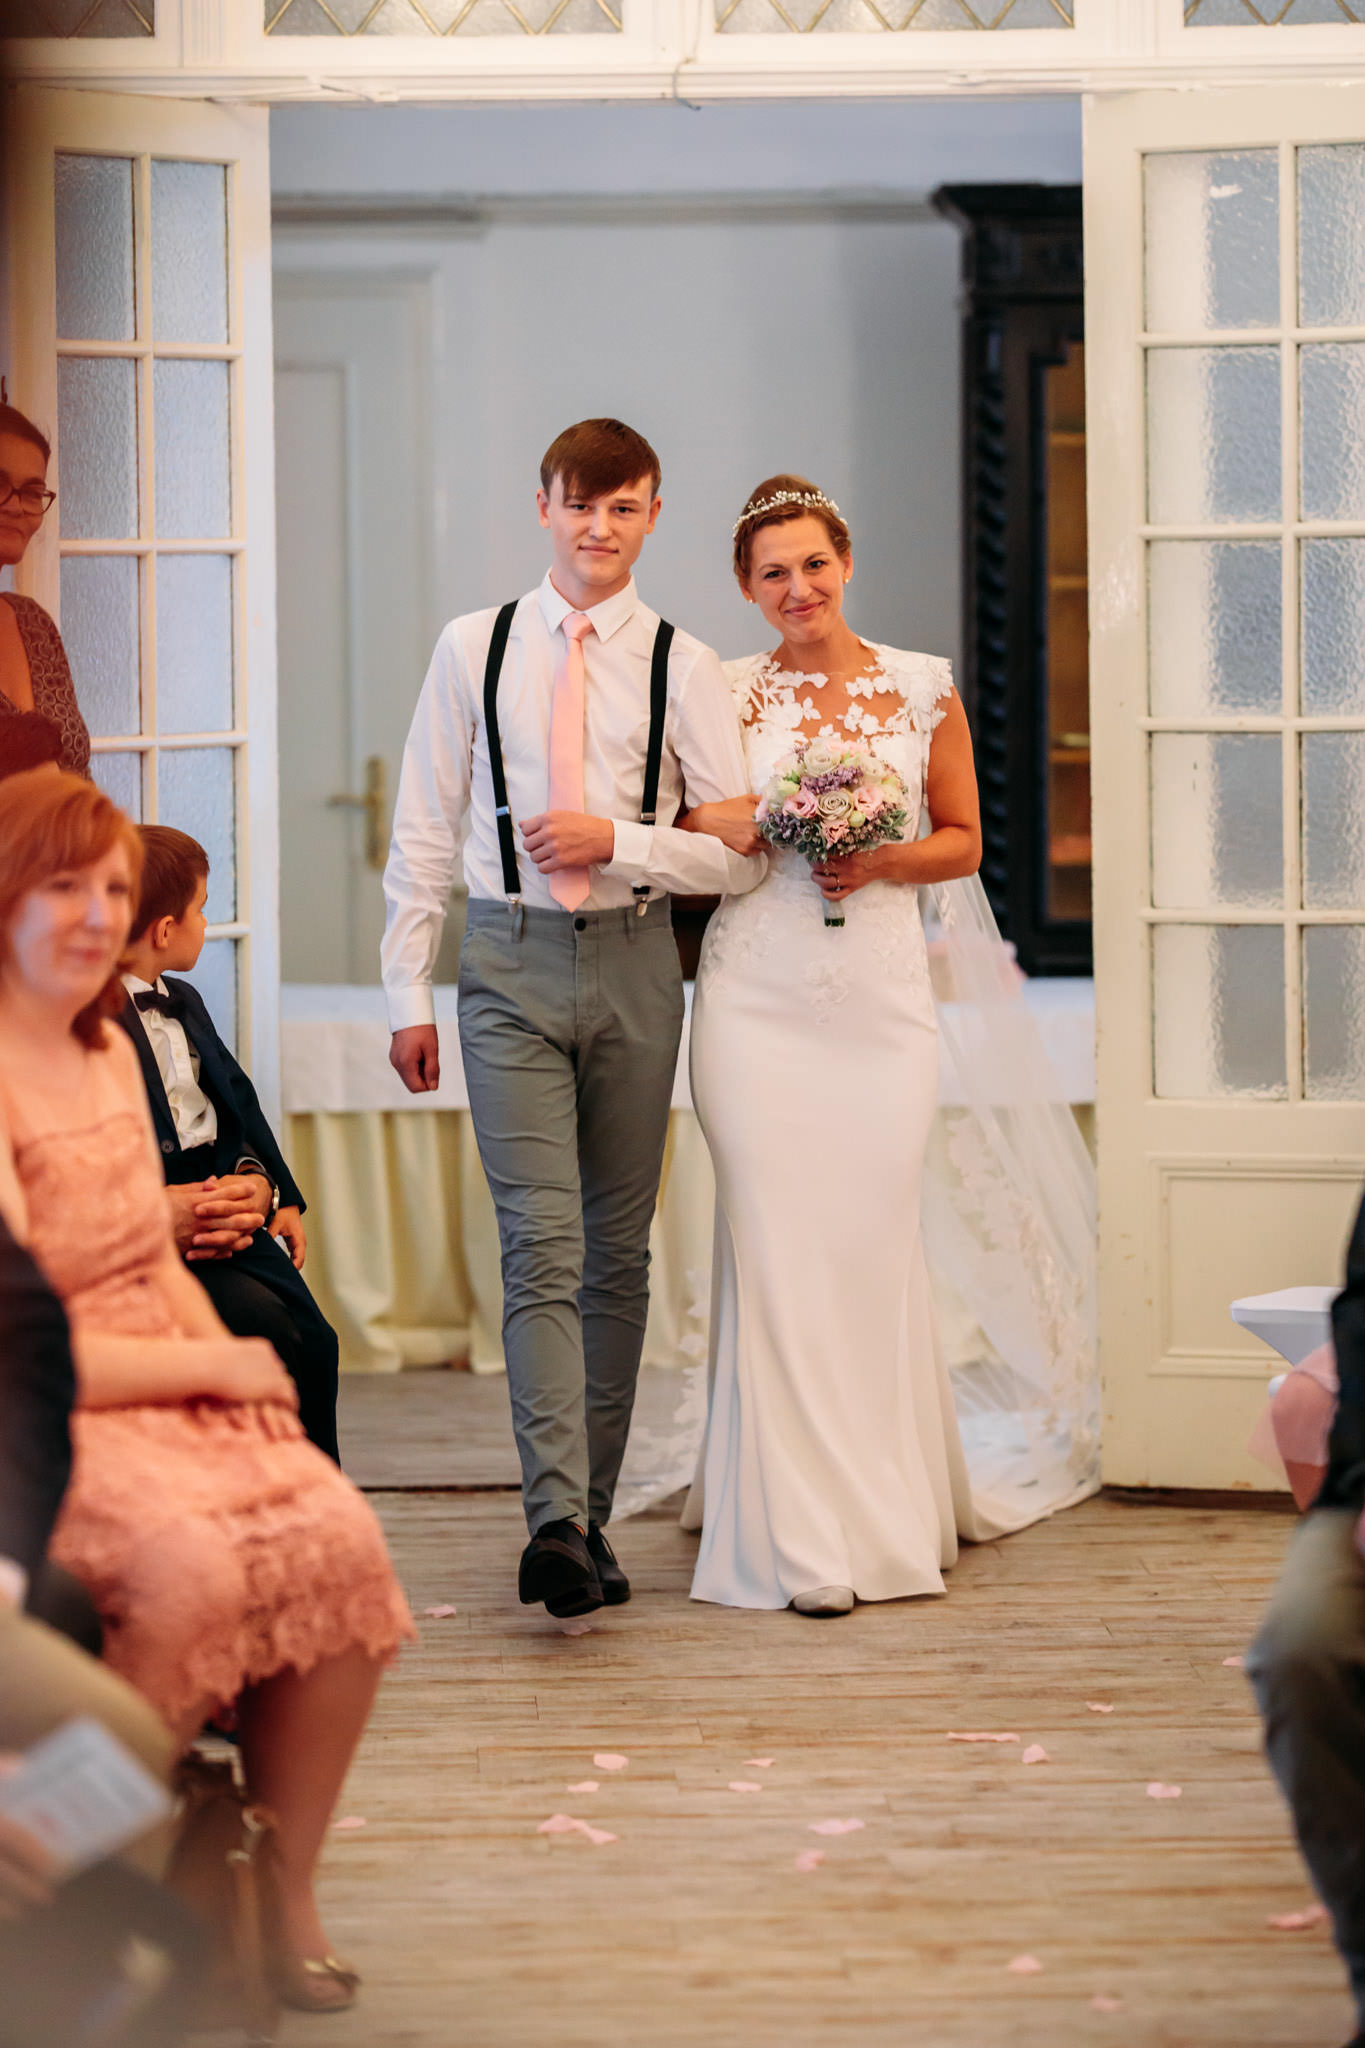 180818_Hochzeit_german_american_grunewald_berlin_locanda_12_apostoli_wedding_web_0005.jpg